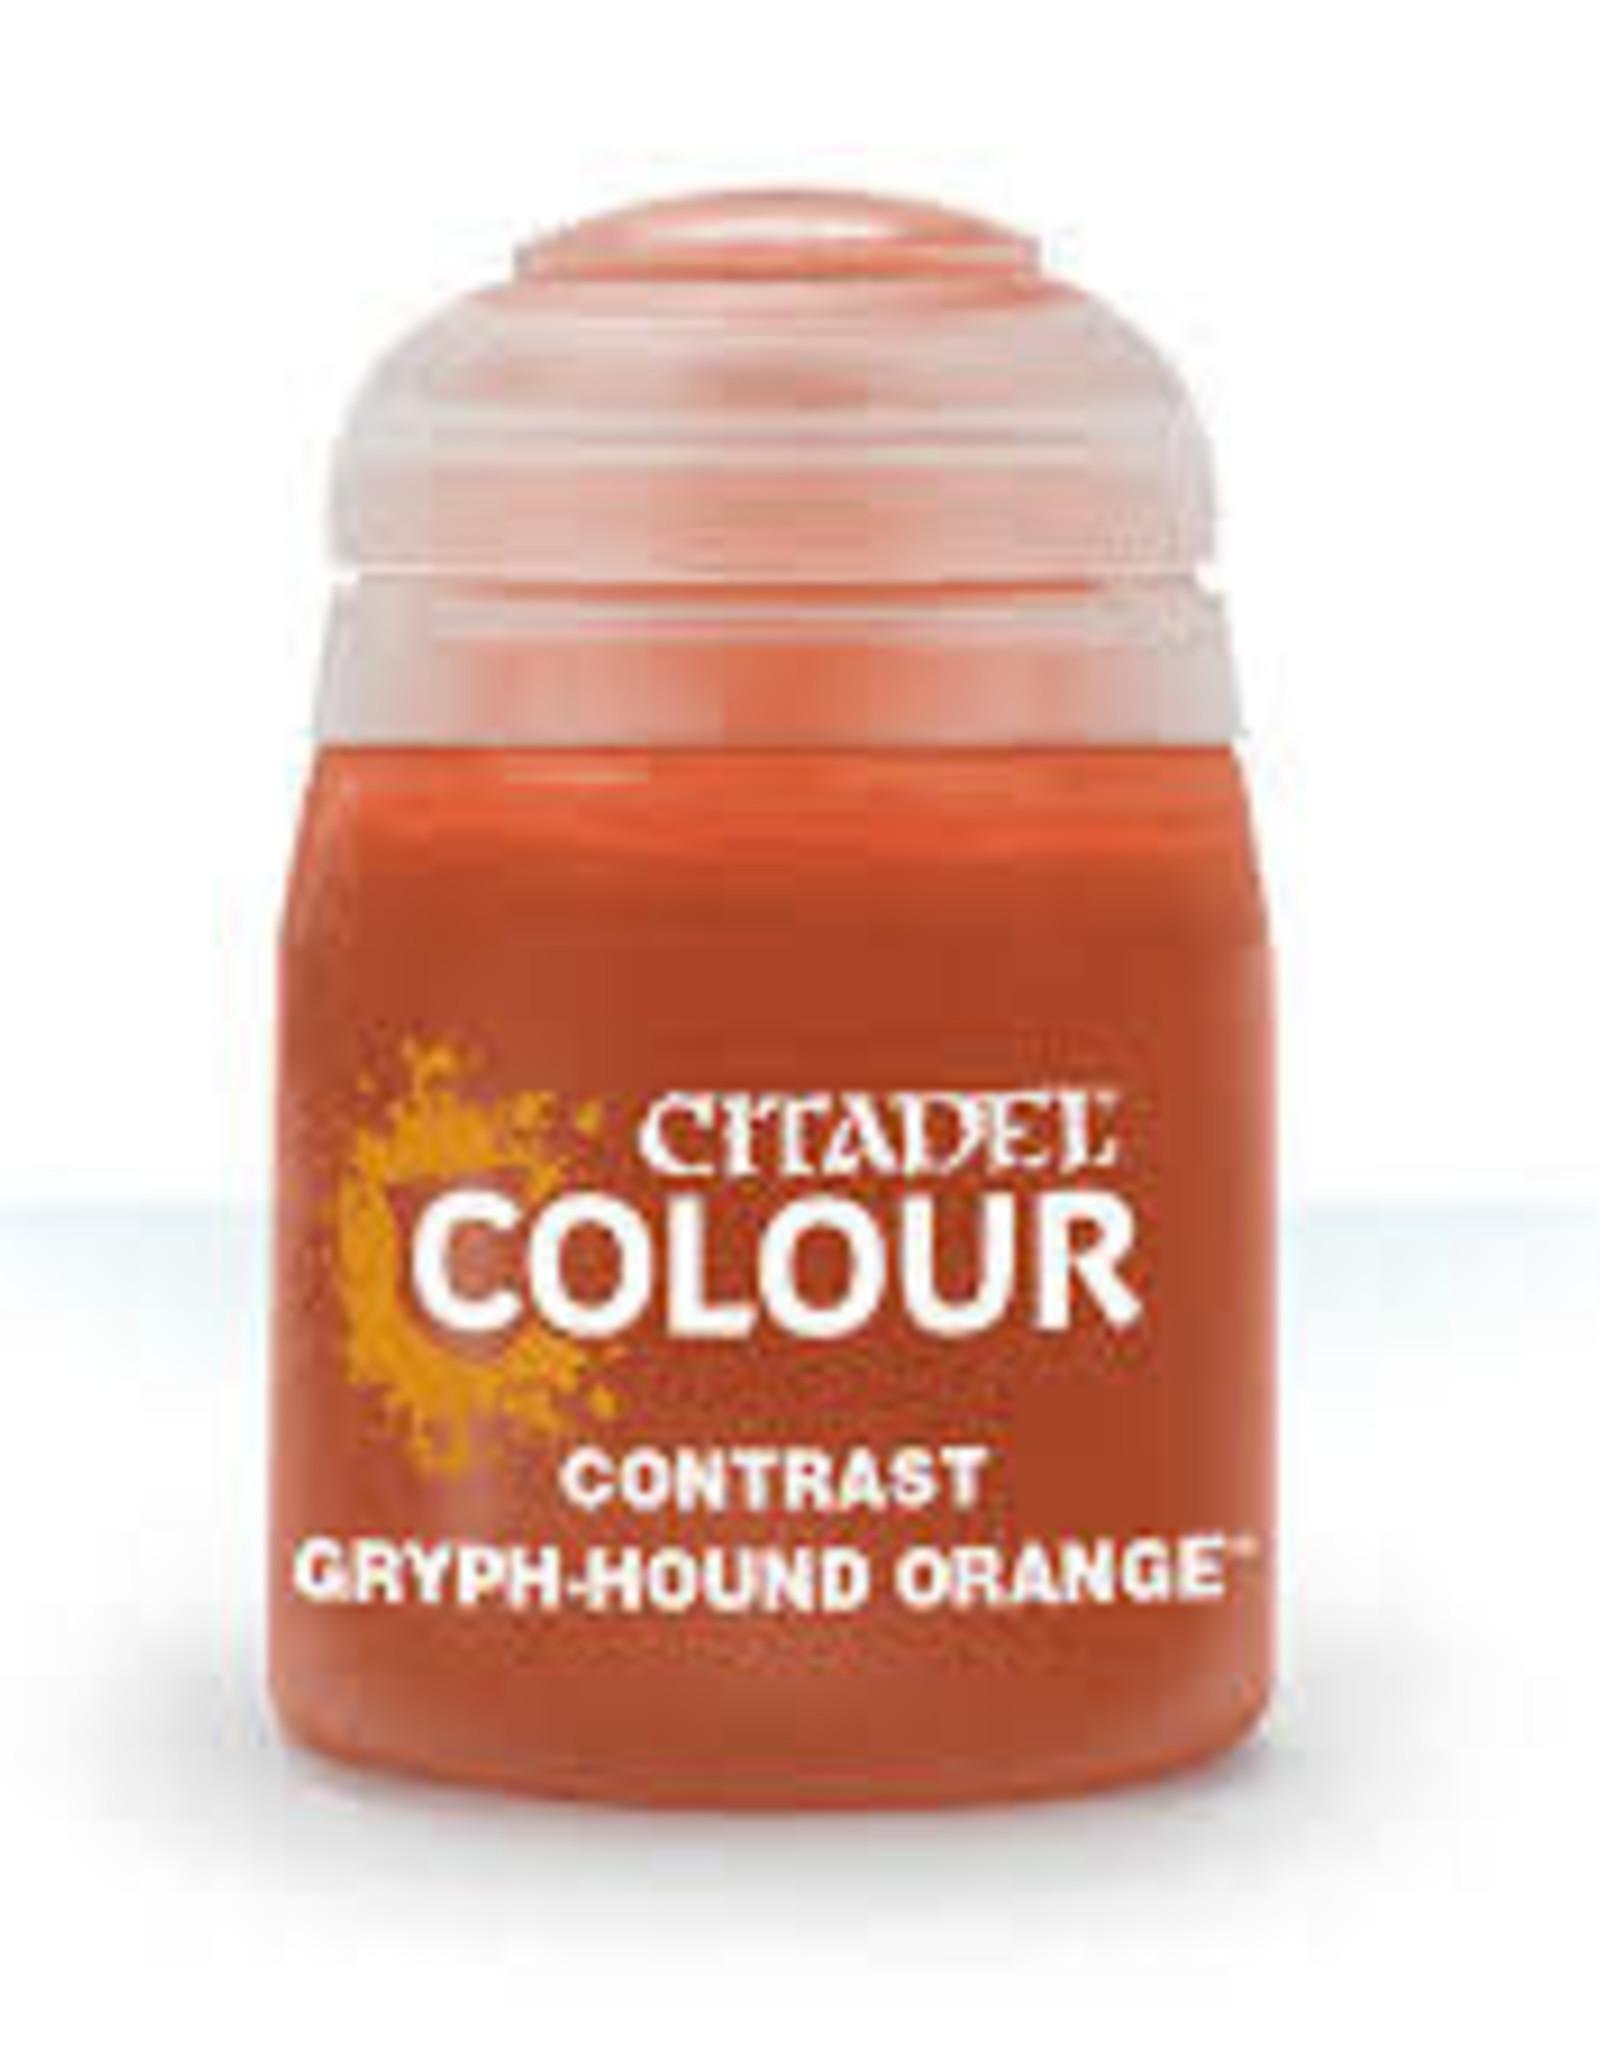 Citadel Paint Gryph-hound Orange